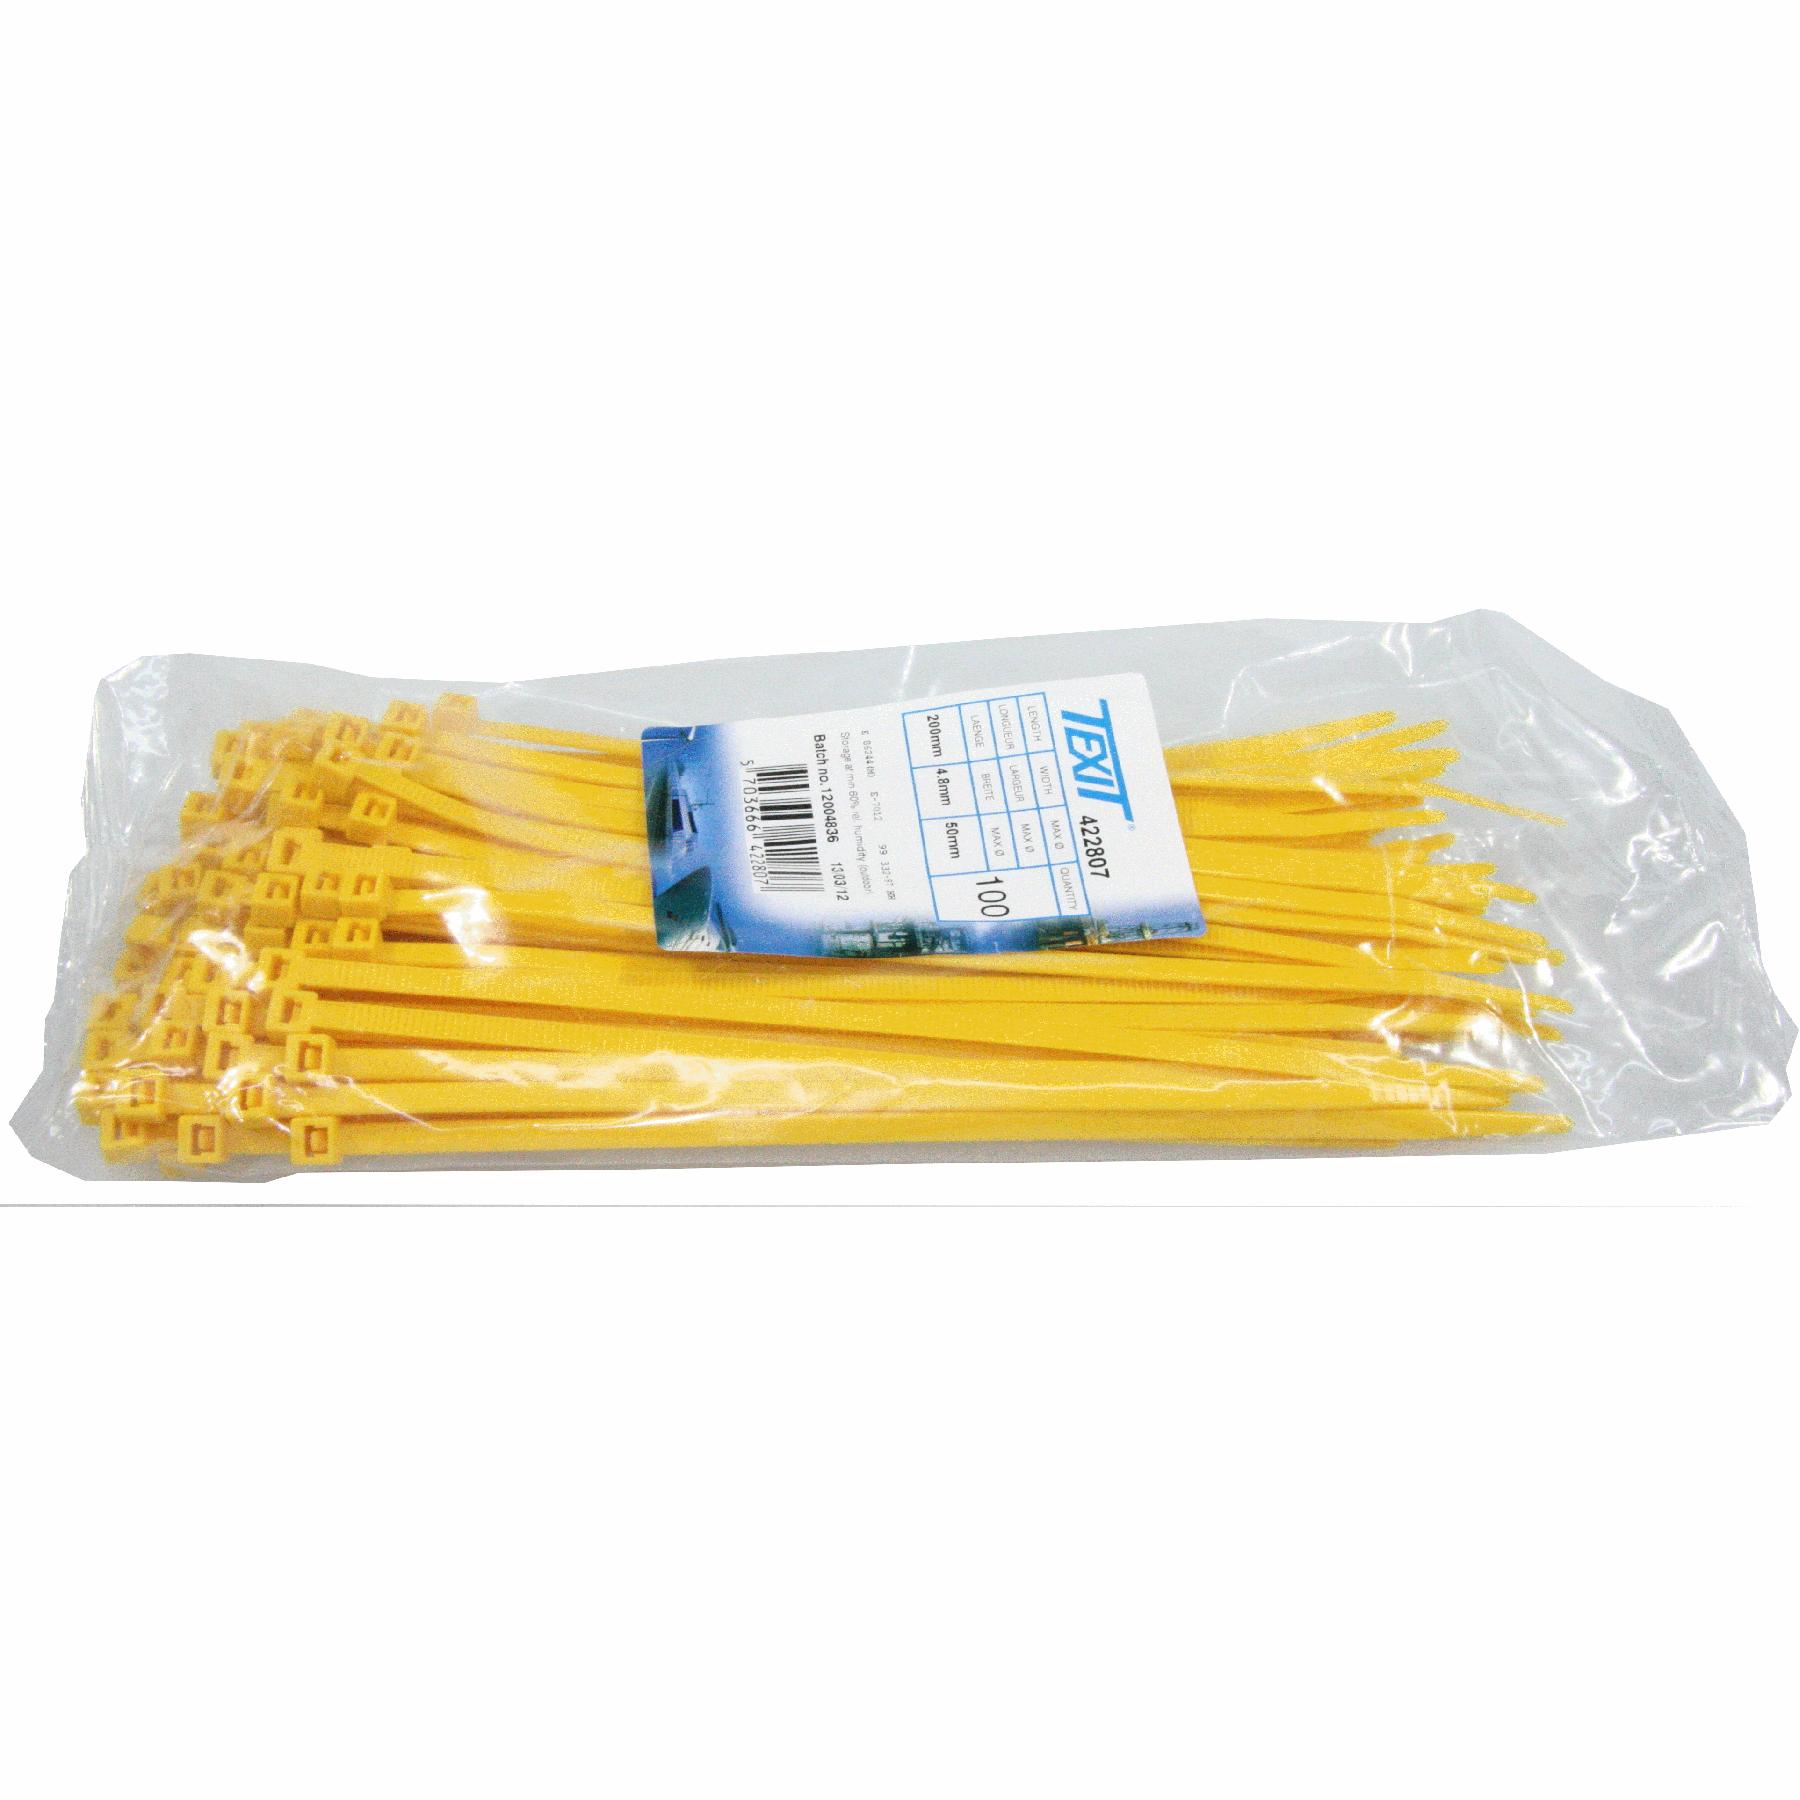 Kabelstrip 200x4,8 geel 100st